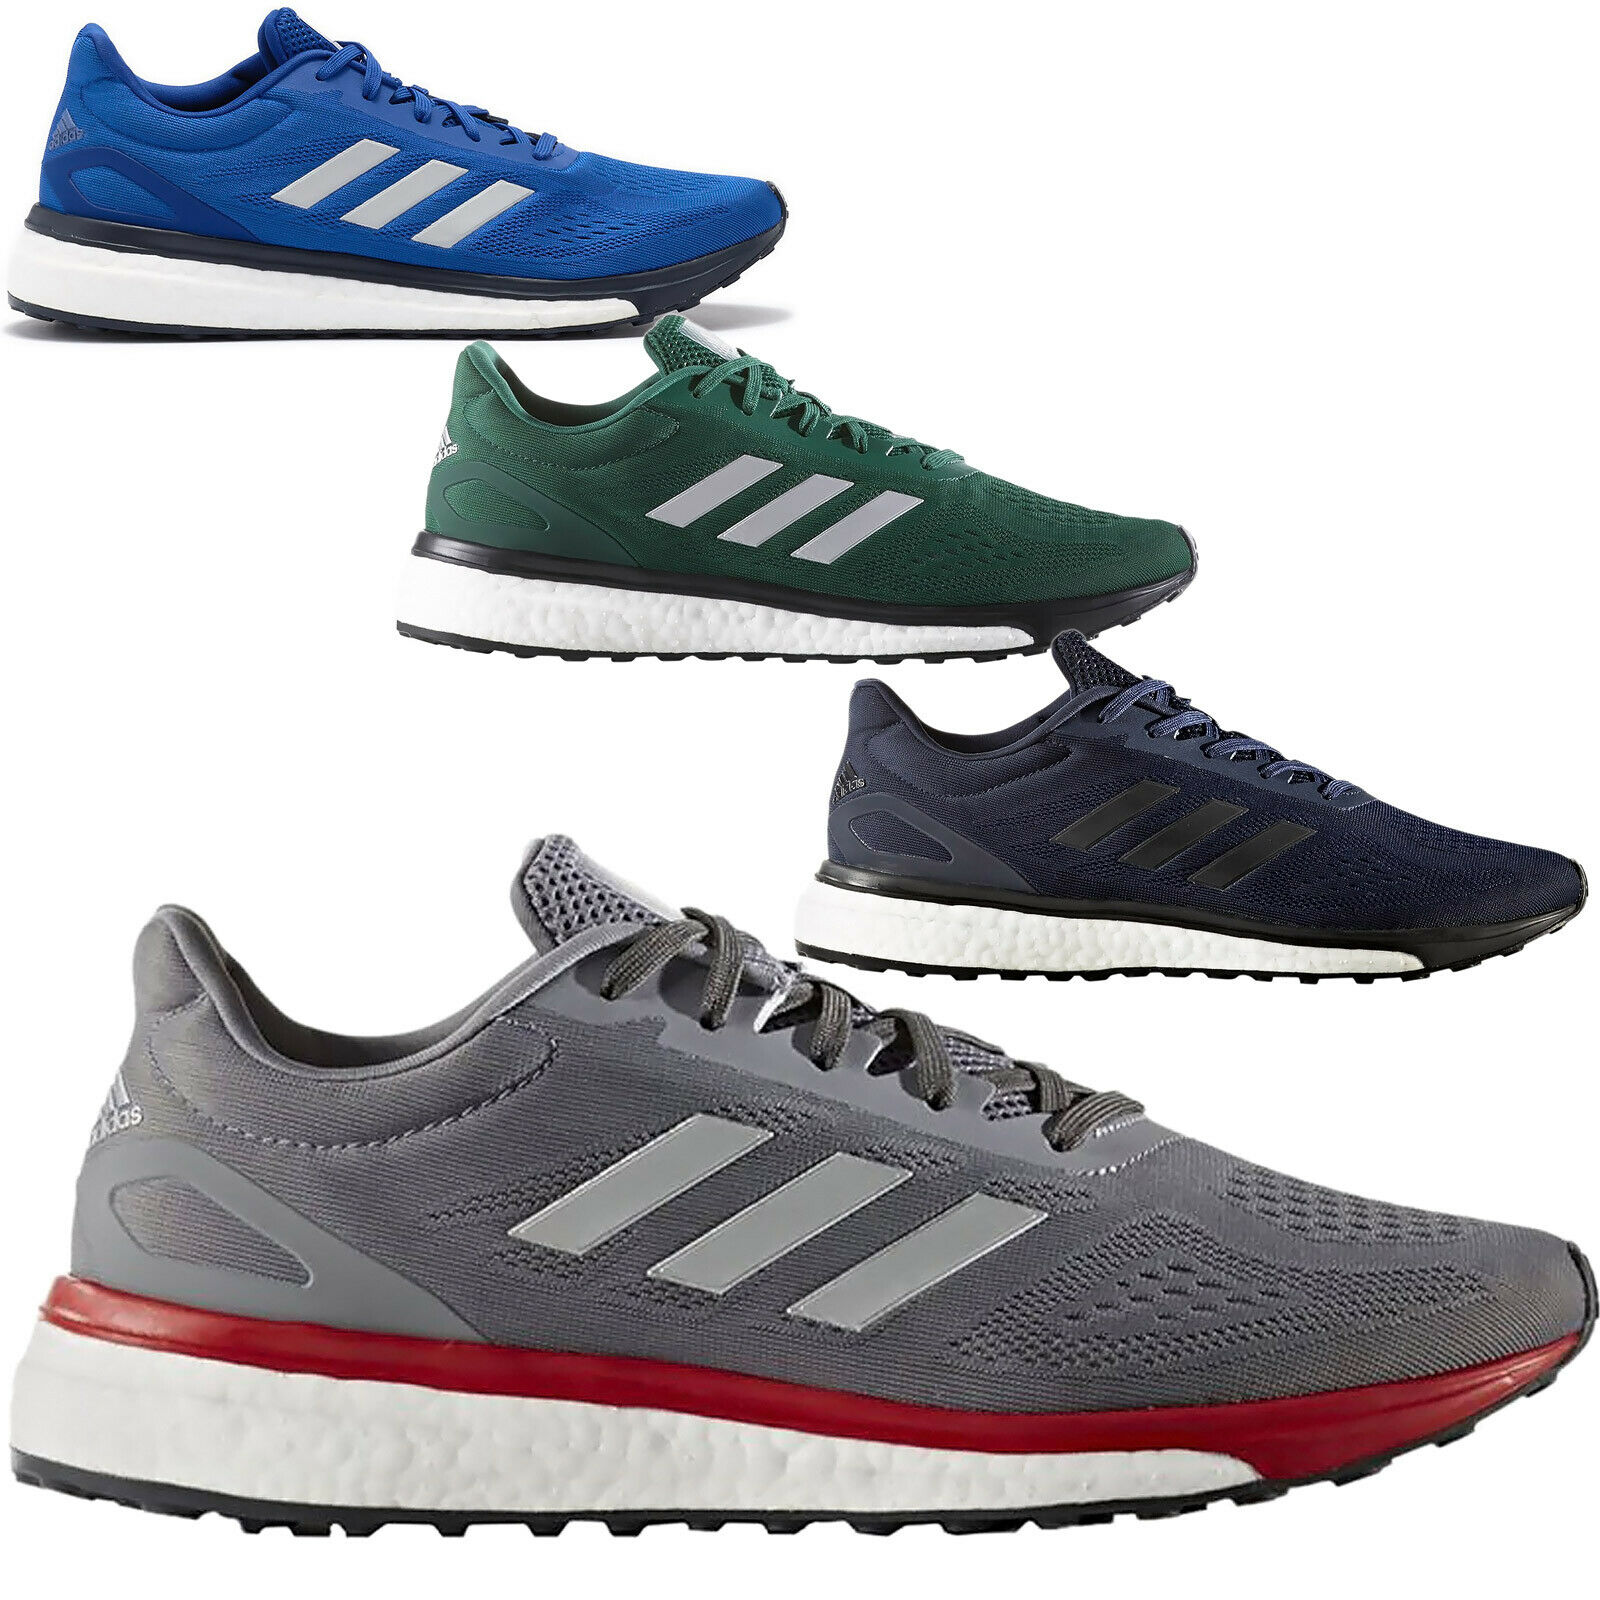 New Adidas Adidas Adidas Response Limited LT Boost Mens Running shoes 243b43